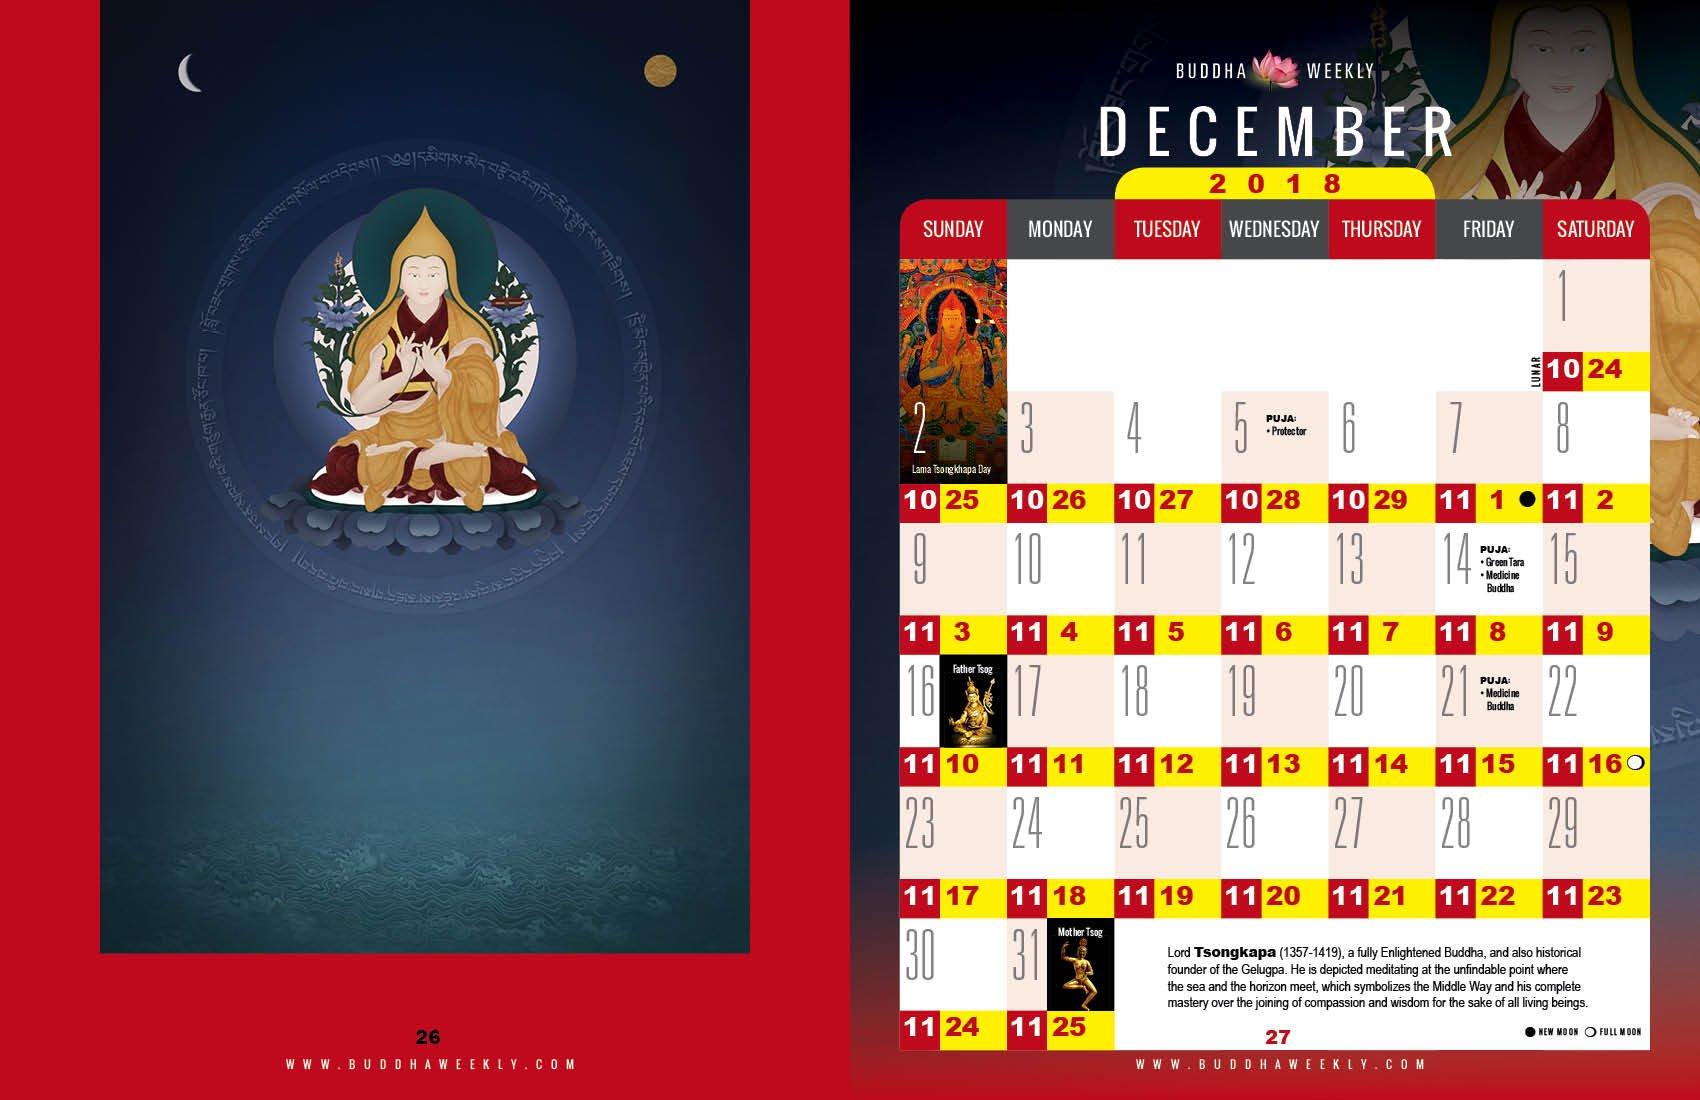 Lunar Calendar 2018 12 Buddha Weekly 12 December low 12